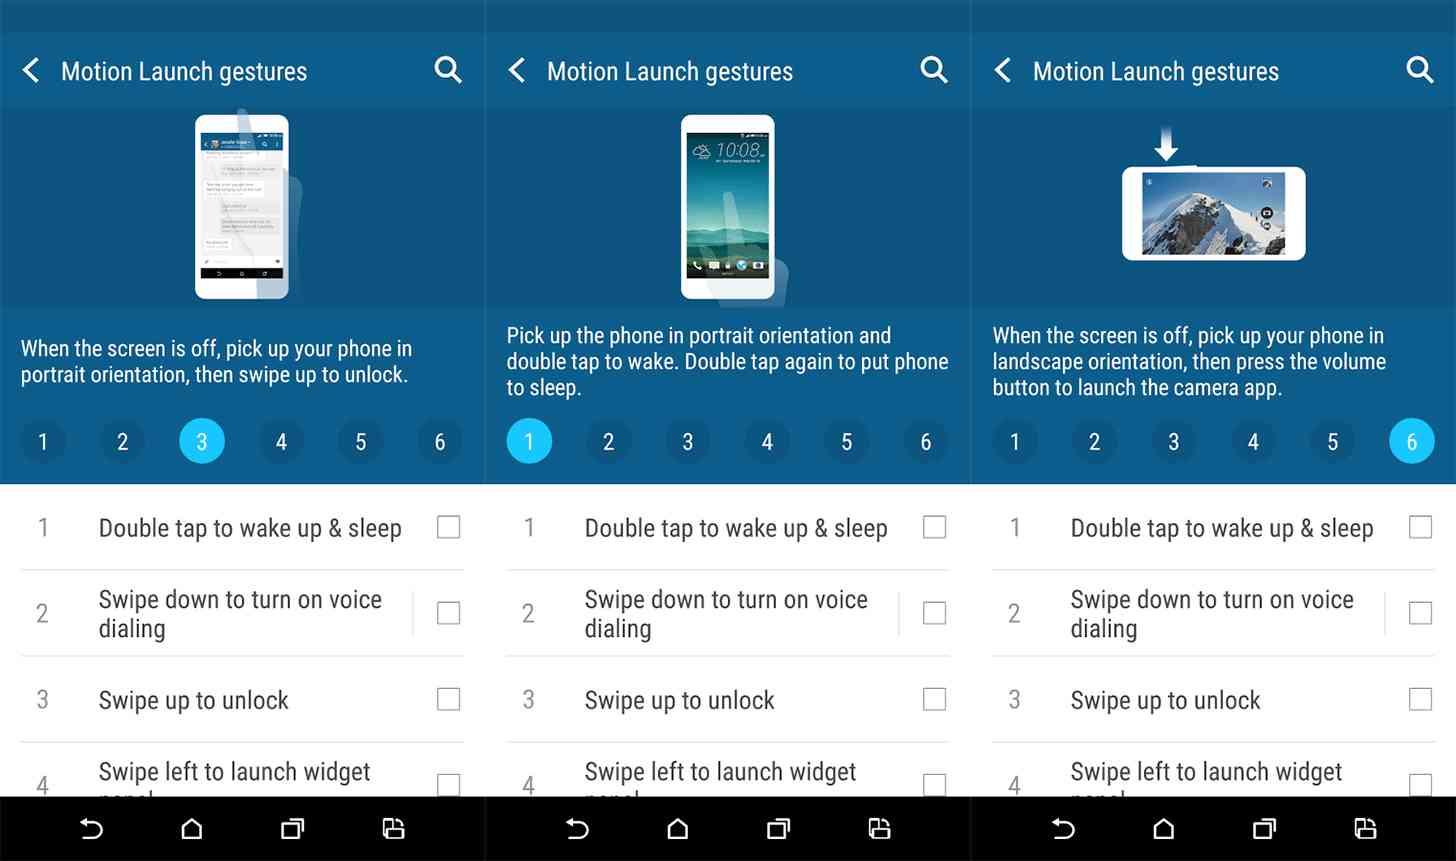 HTC Motion Launch app screenshots